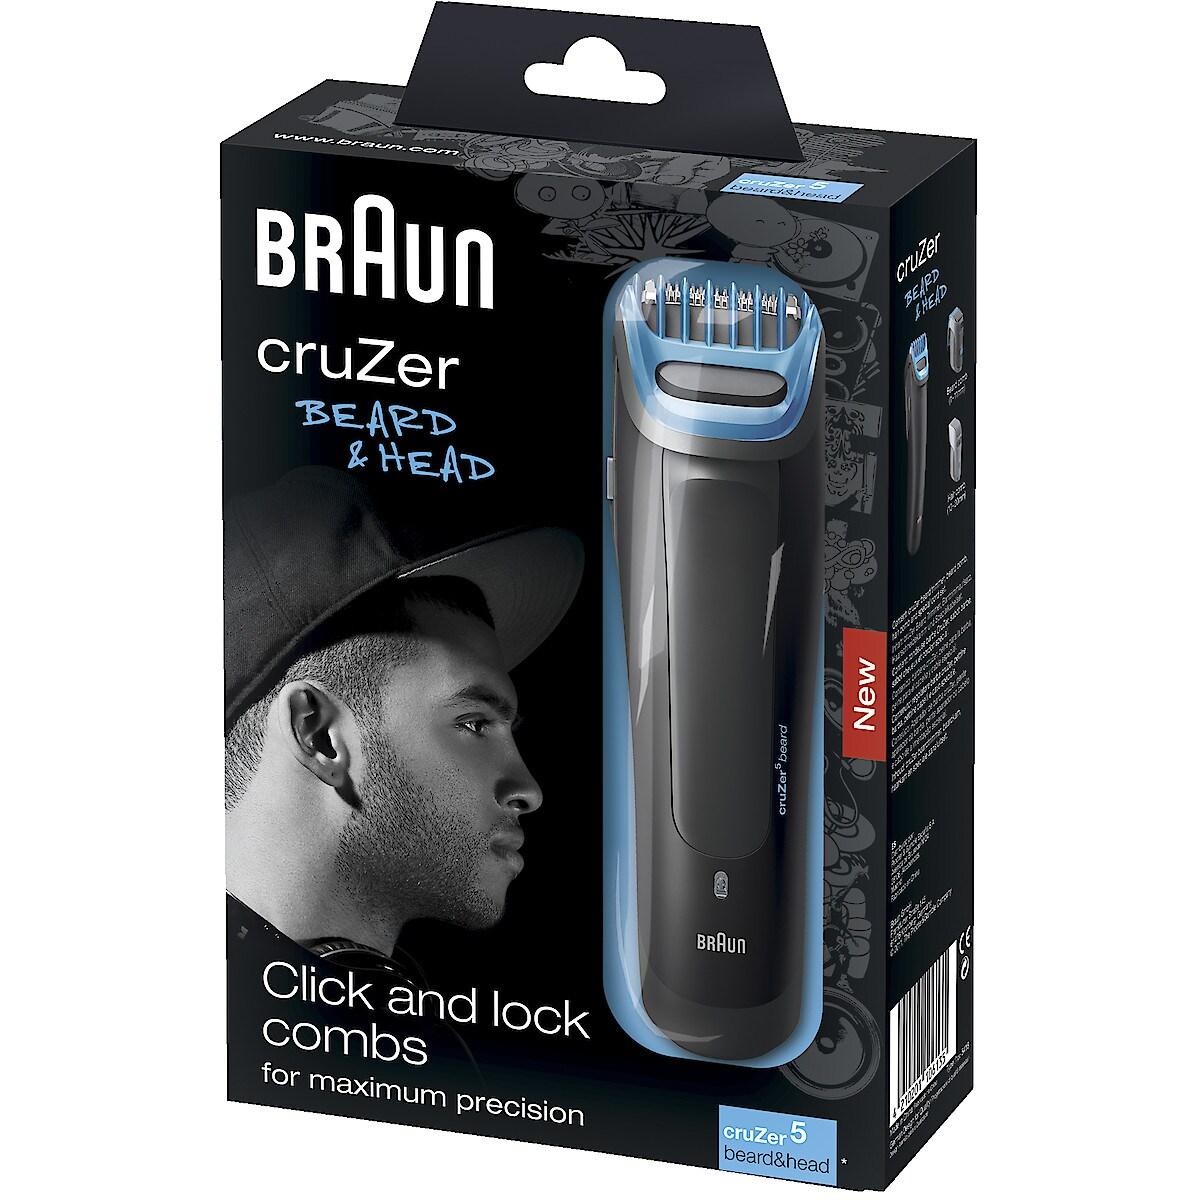 Skäggtrimmer Braun CruZer 5 Beard & Head